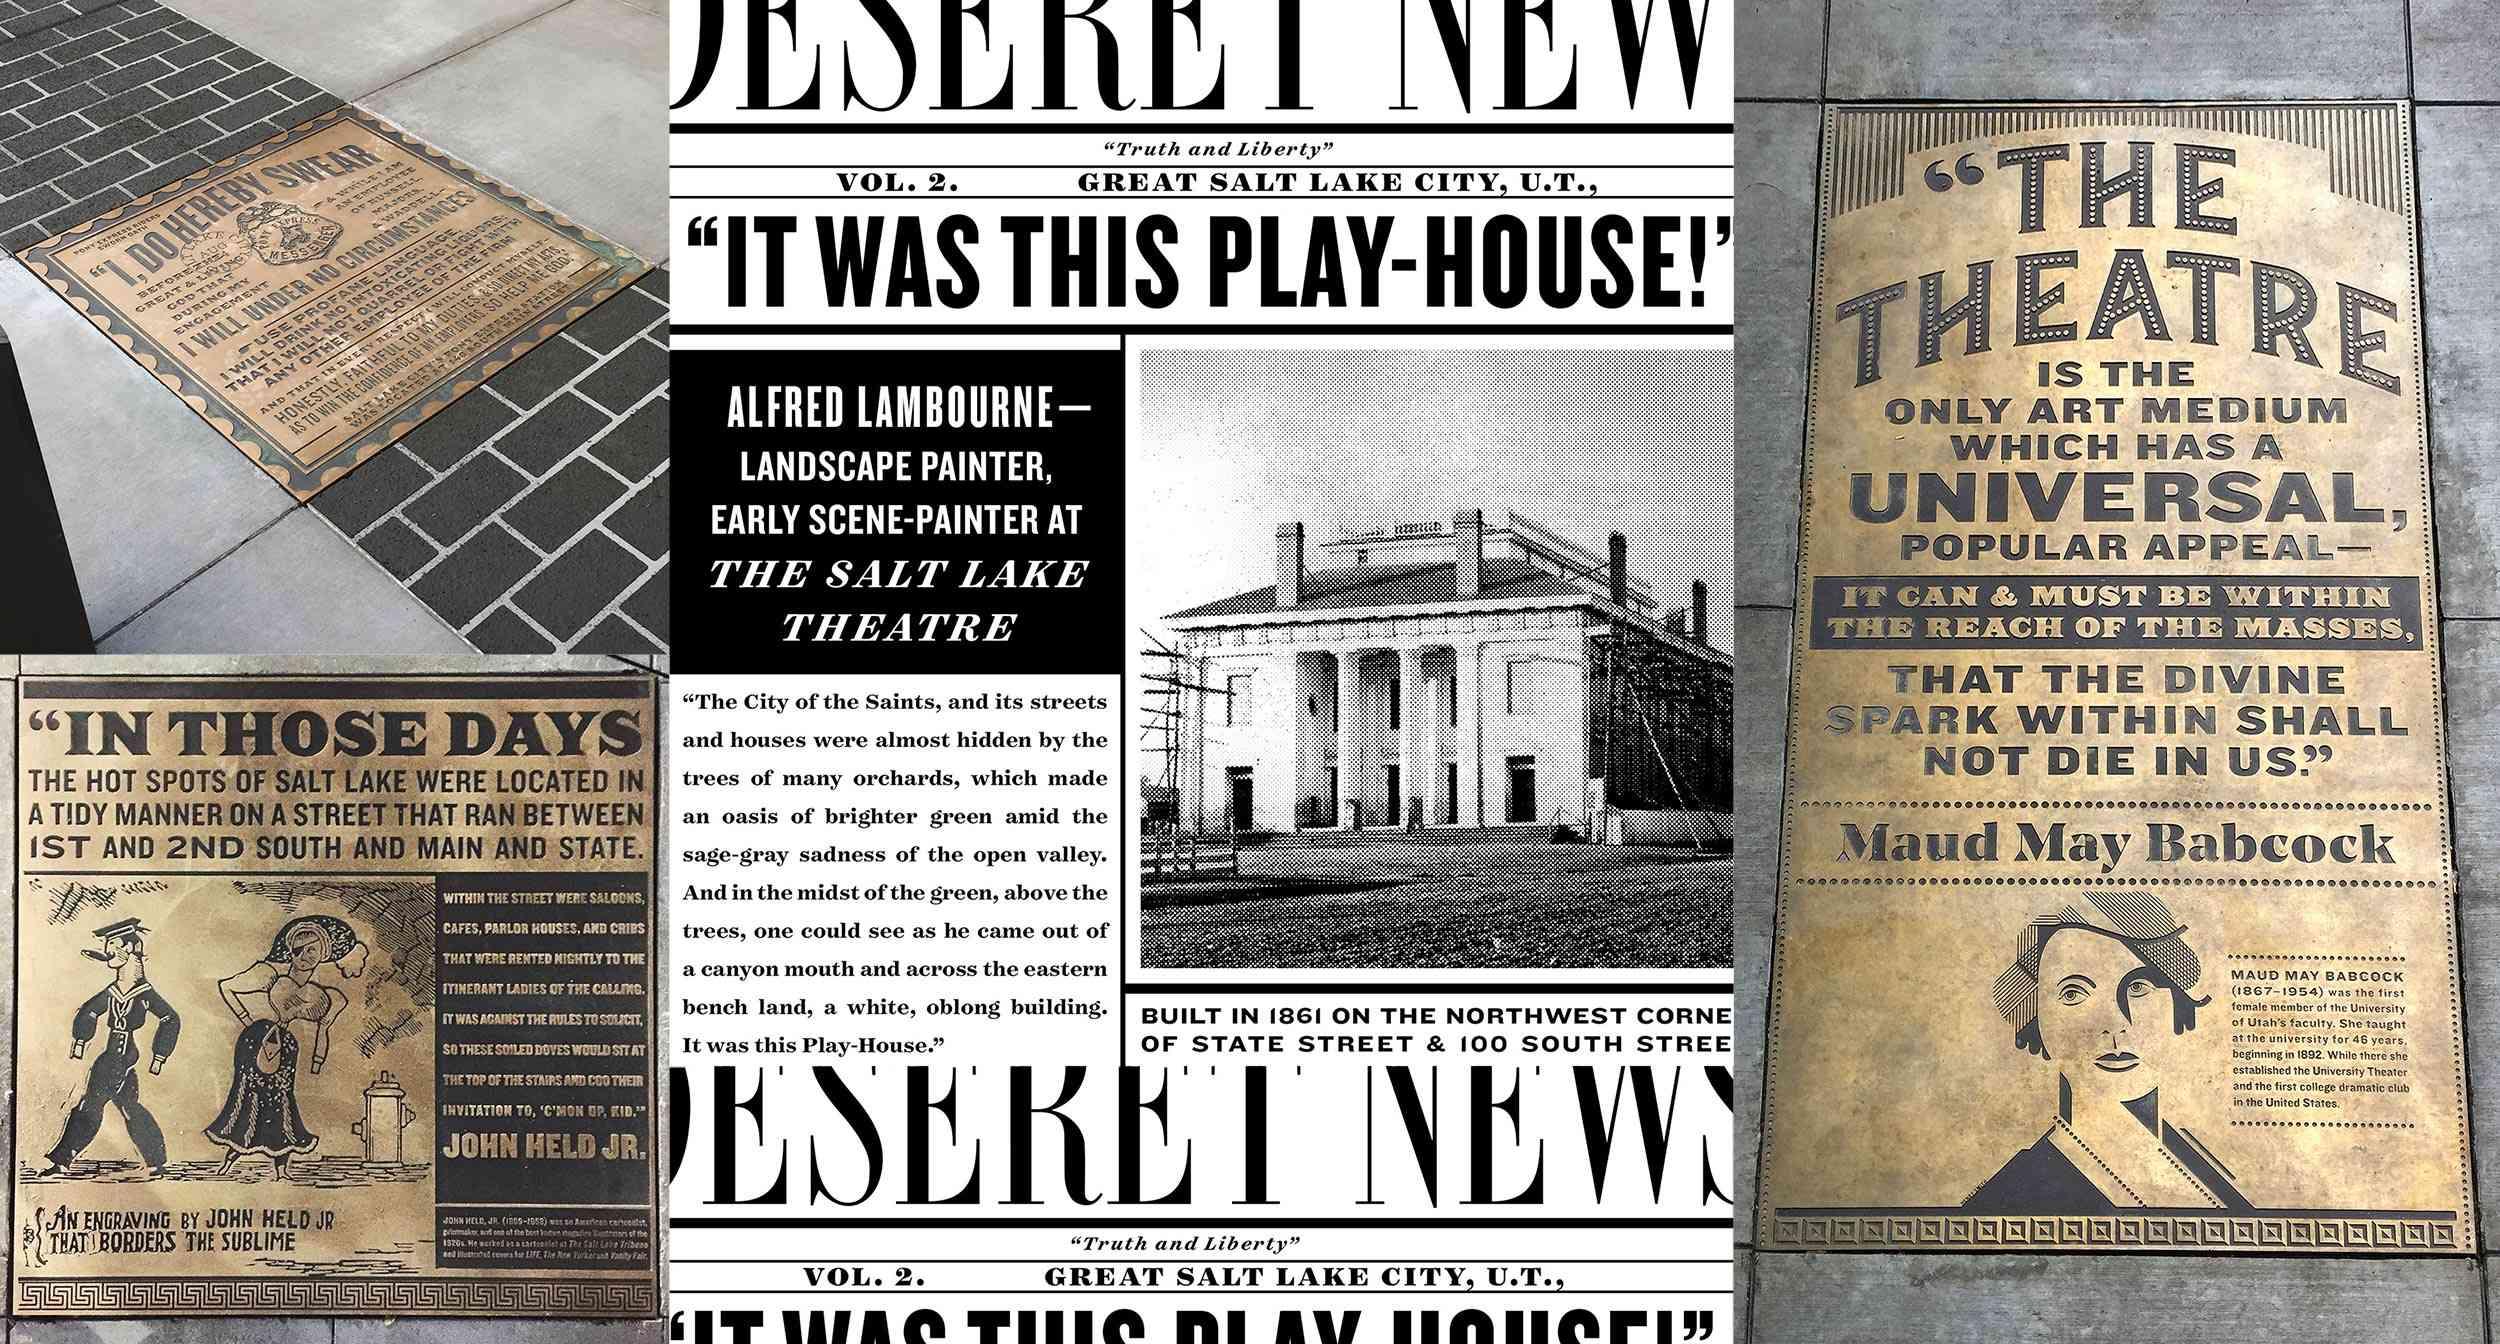 Regent Street Historical News Inserts on Sidewalk